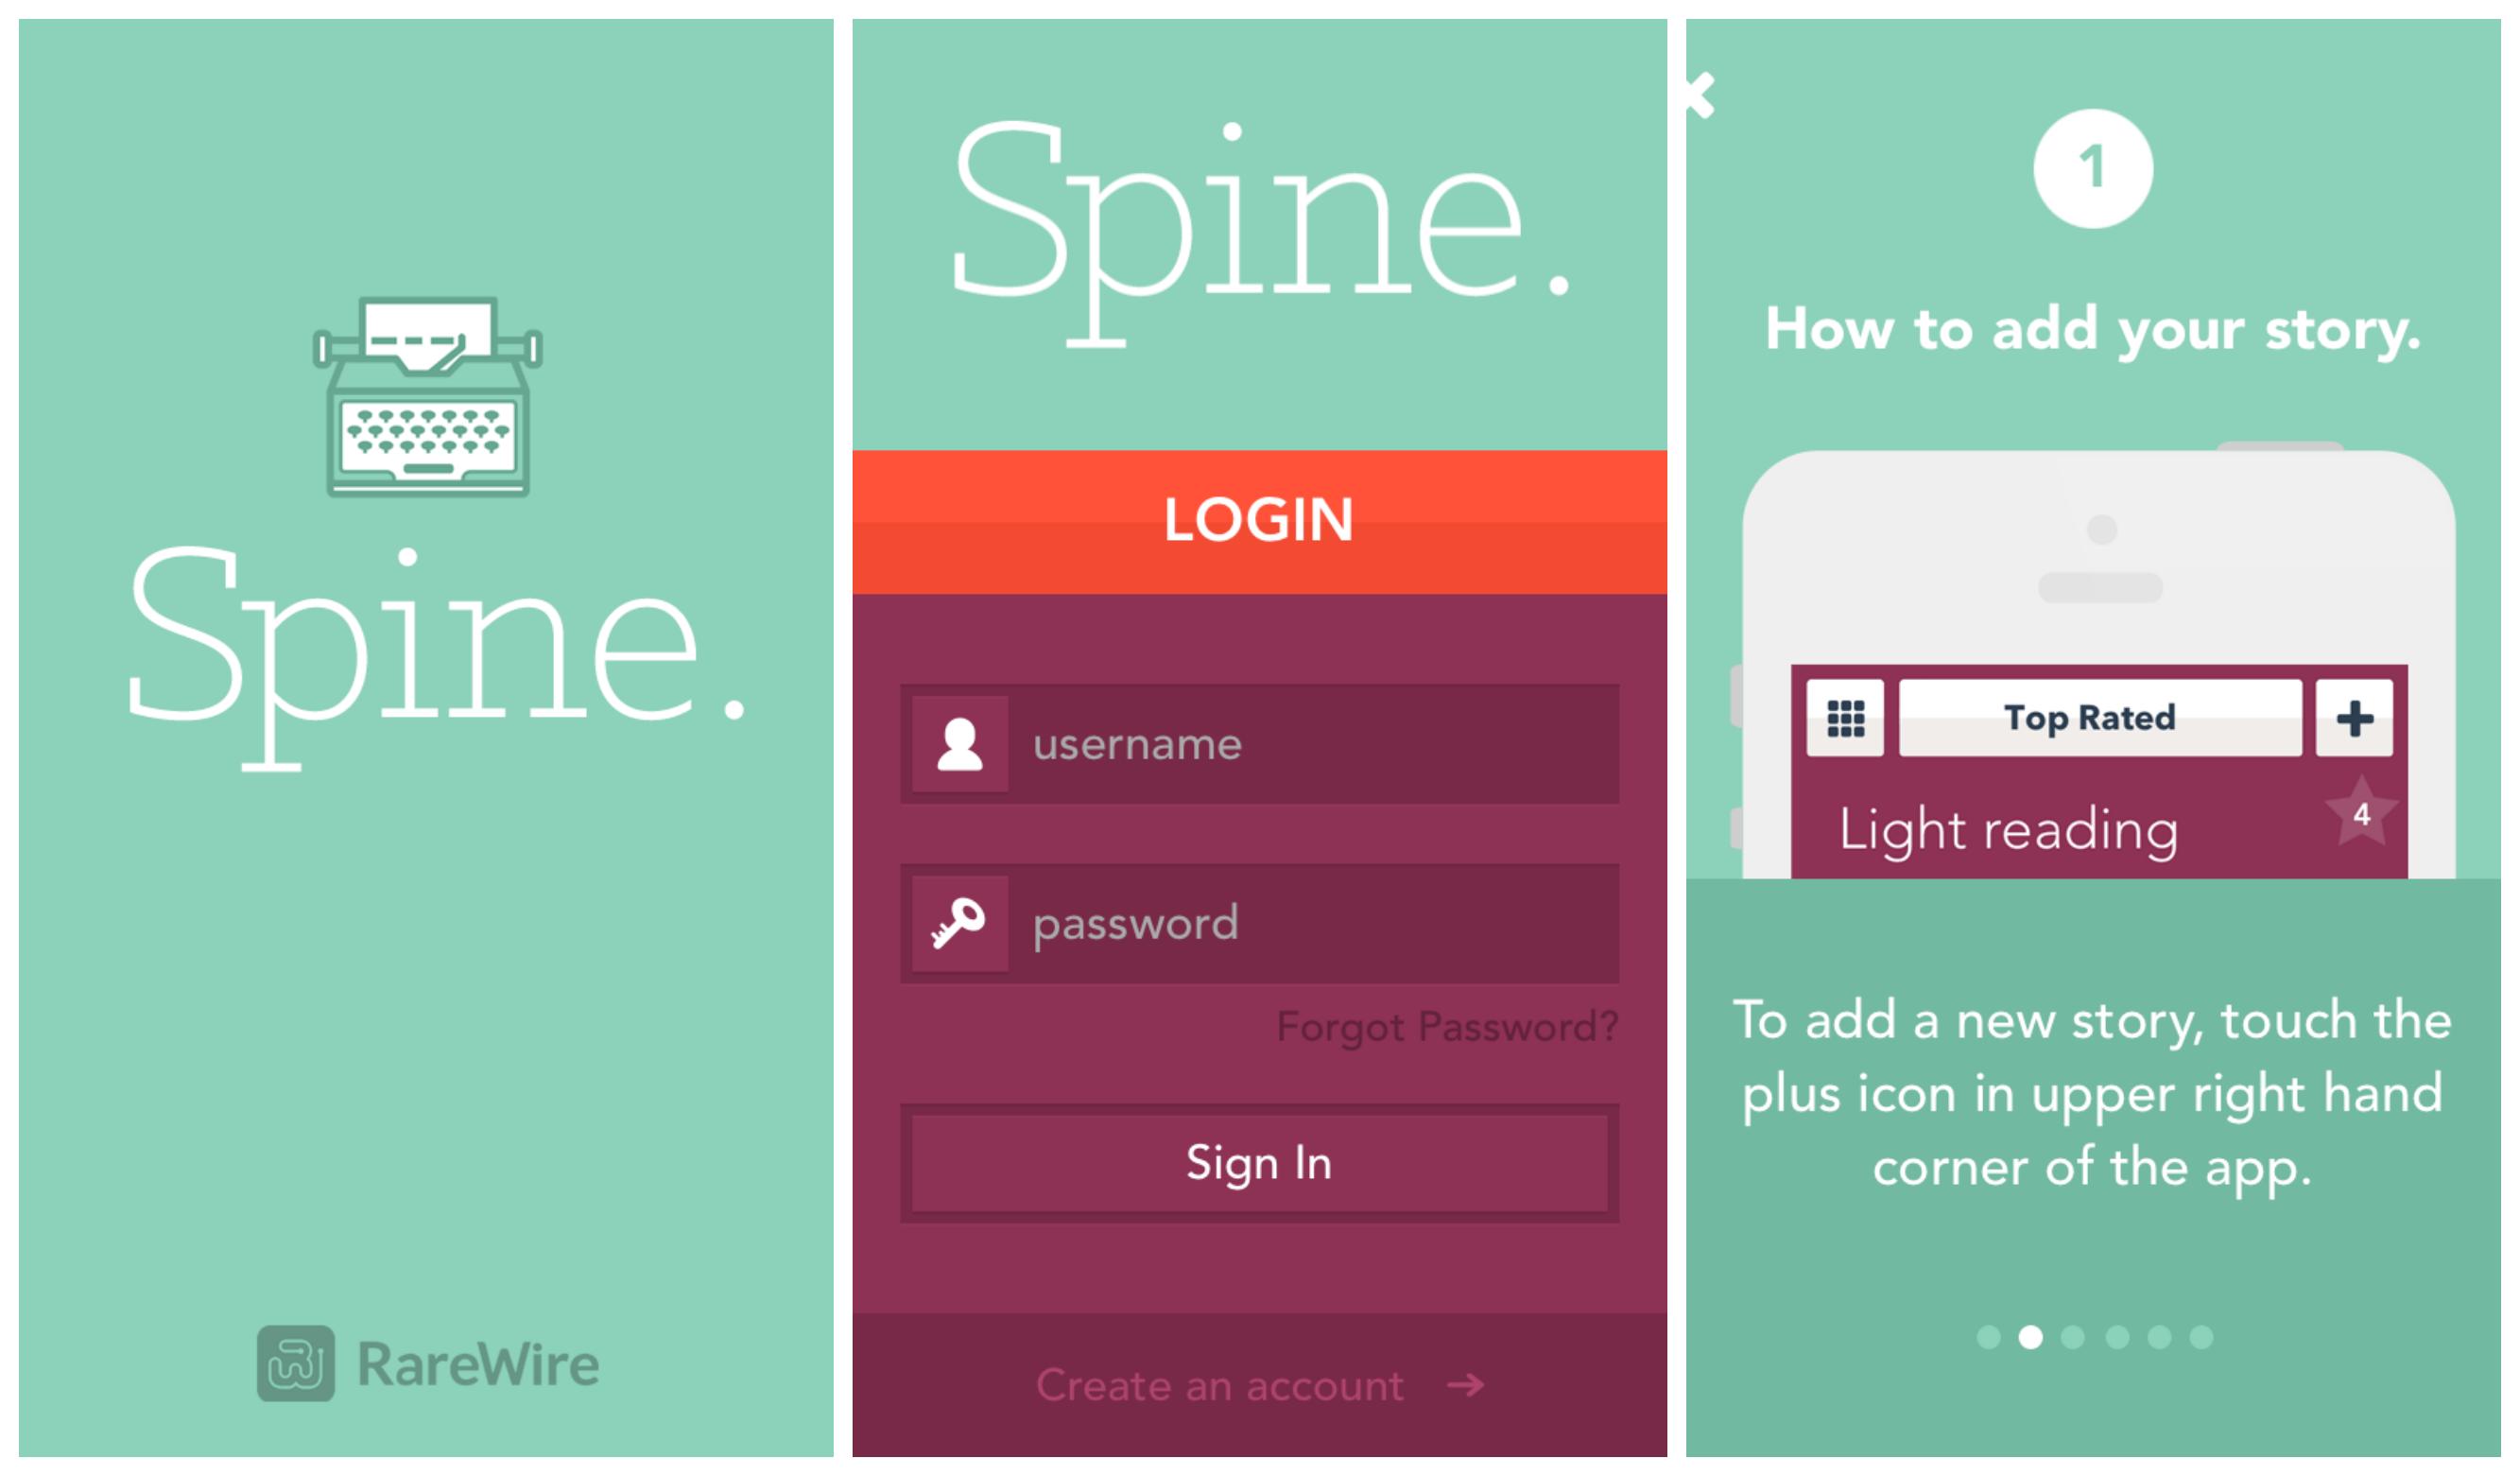 app design inspiration | Design Loves | Pinterest | App design ...